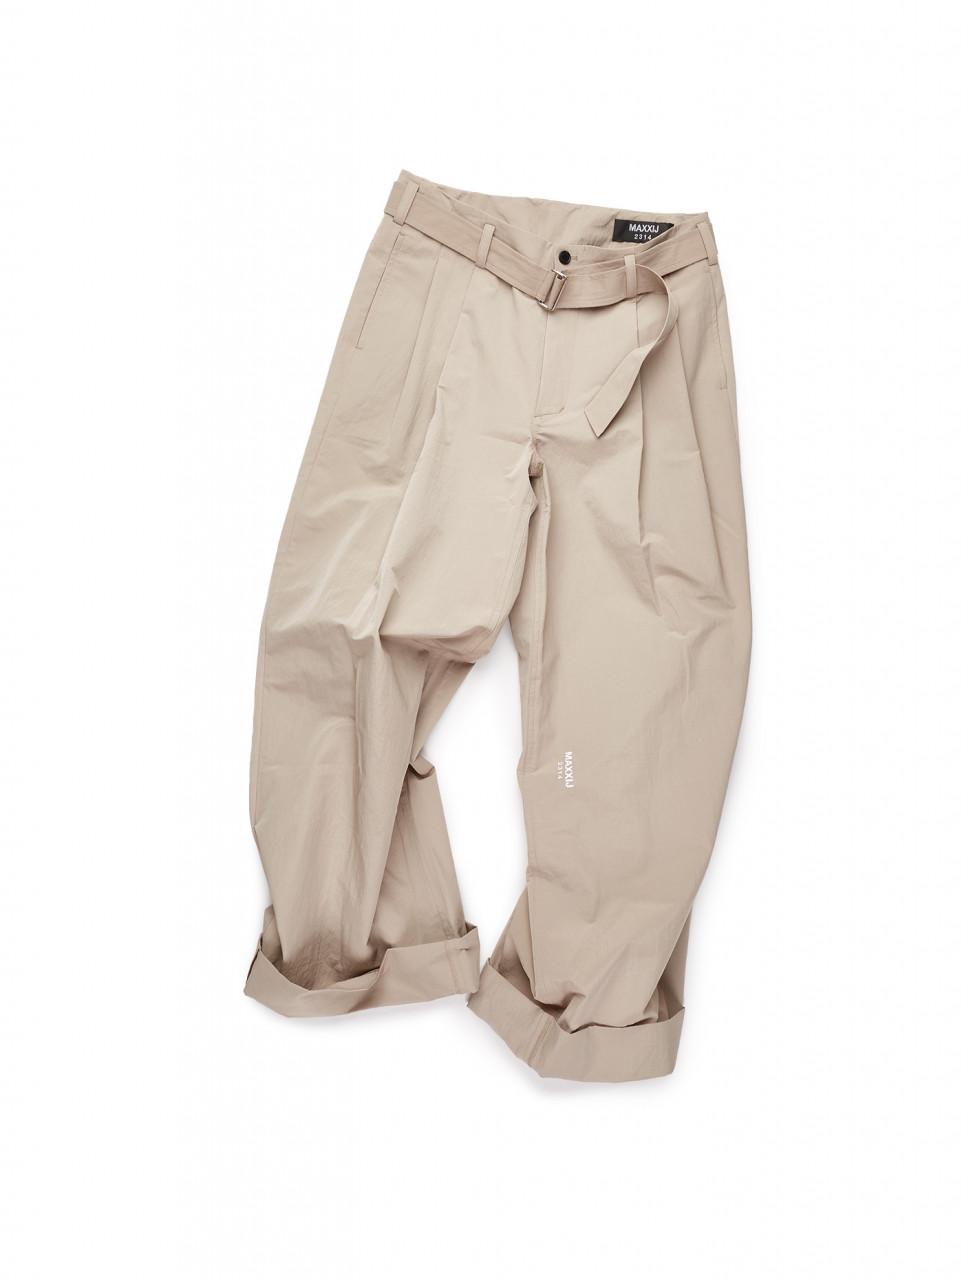 351-20XX010 MAXXIJ Beige Cotton Nylon Loose Trousers